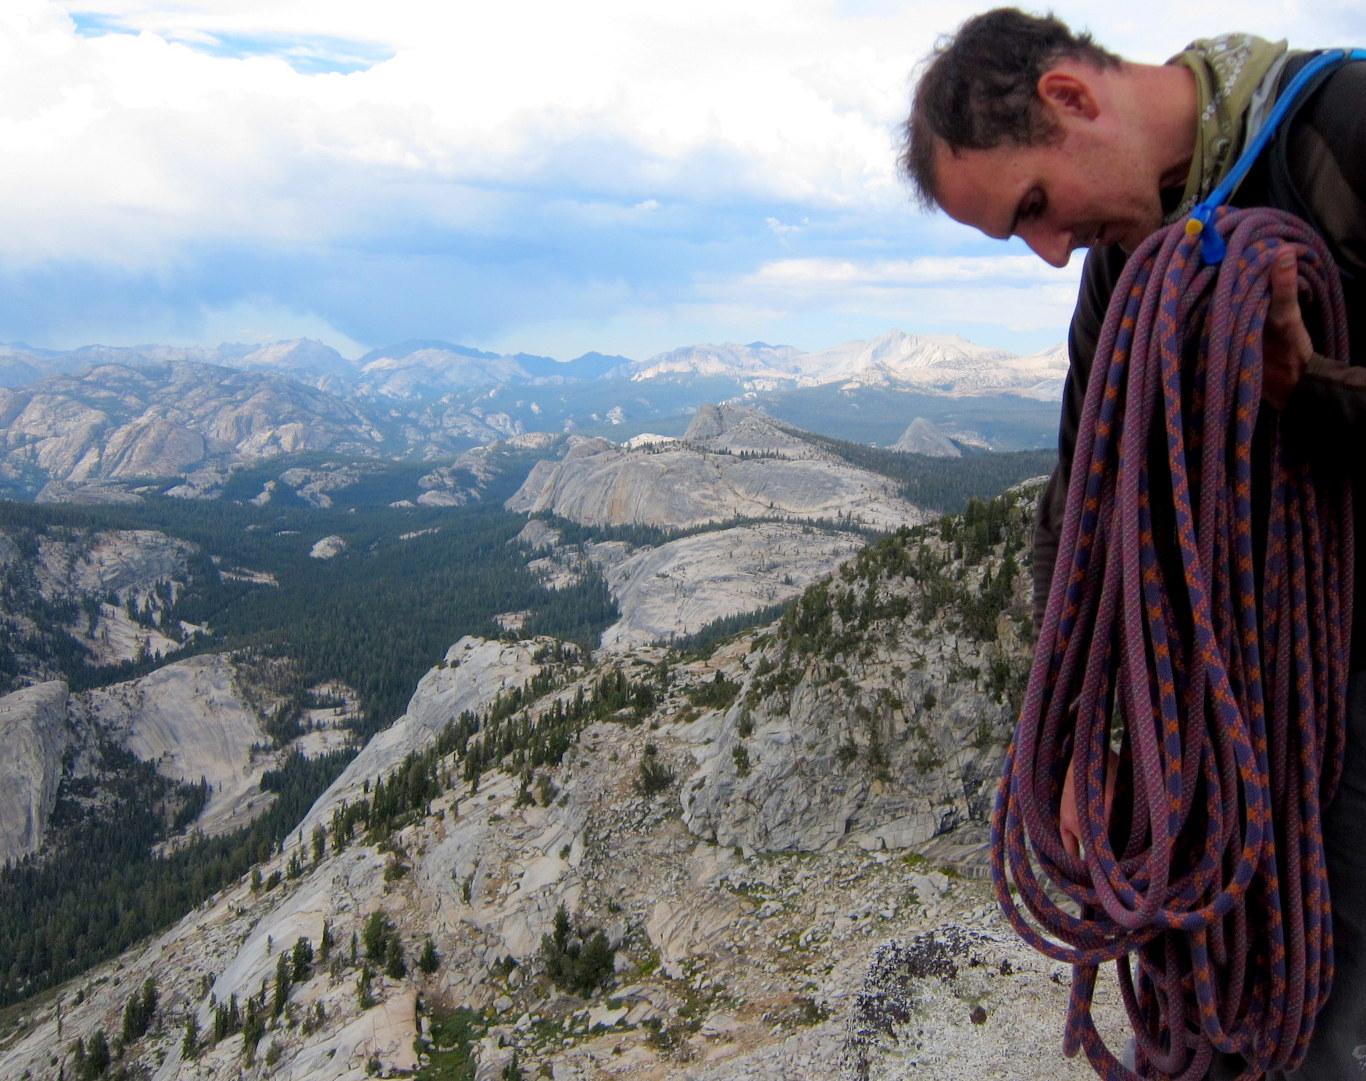 The view from the top of Tenaya Peak